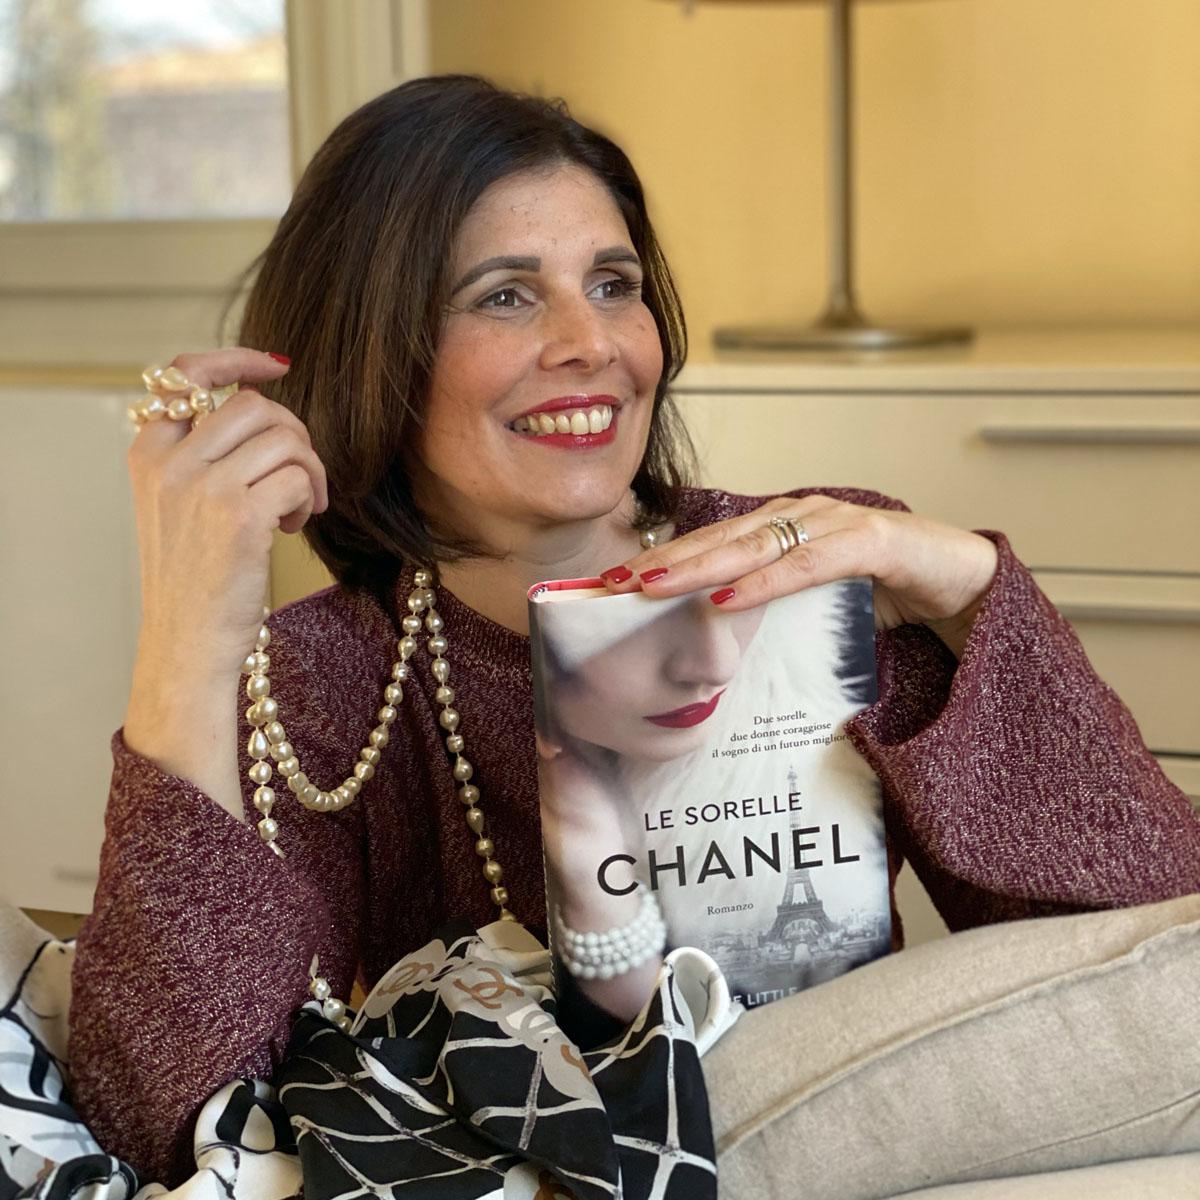 """ Le sorelle Chanel"" di Judithe Little"